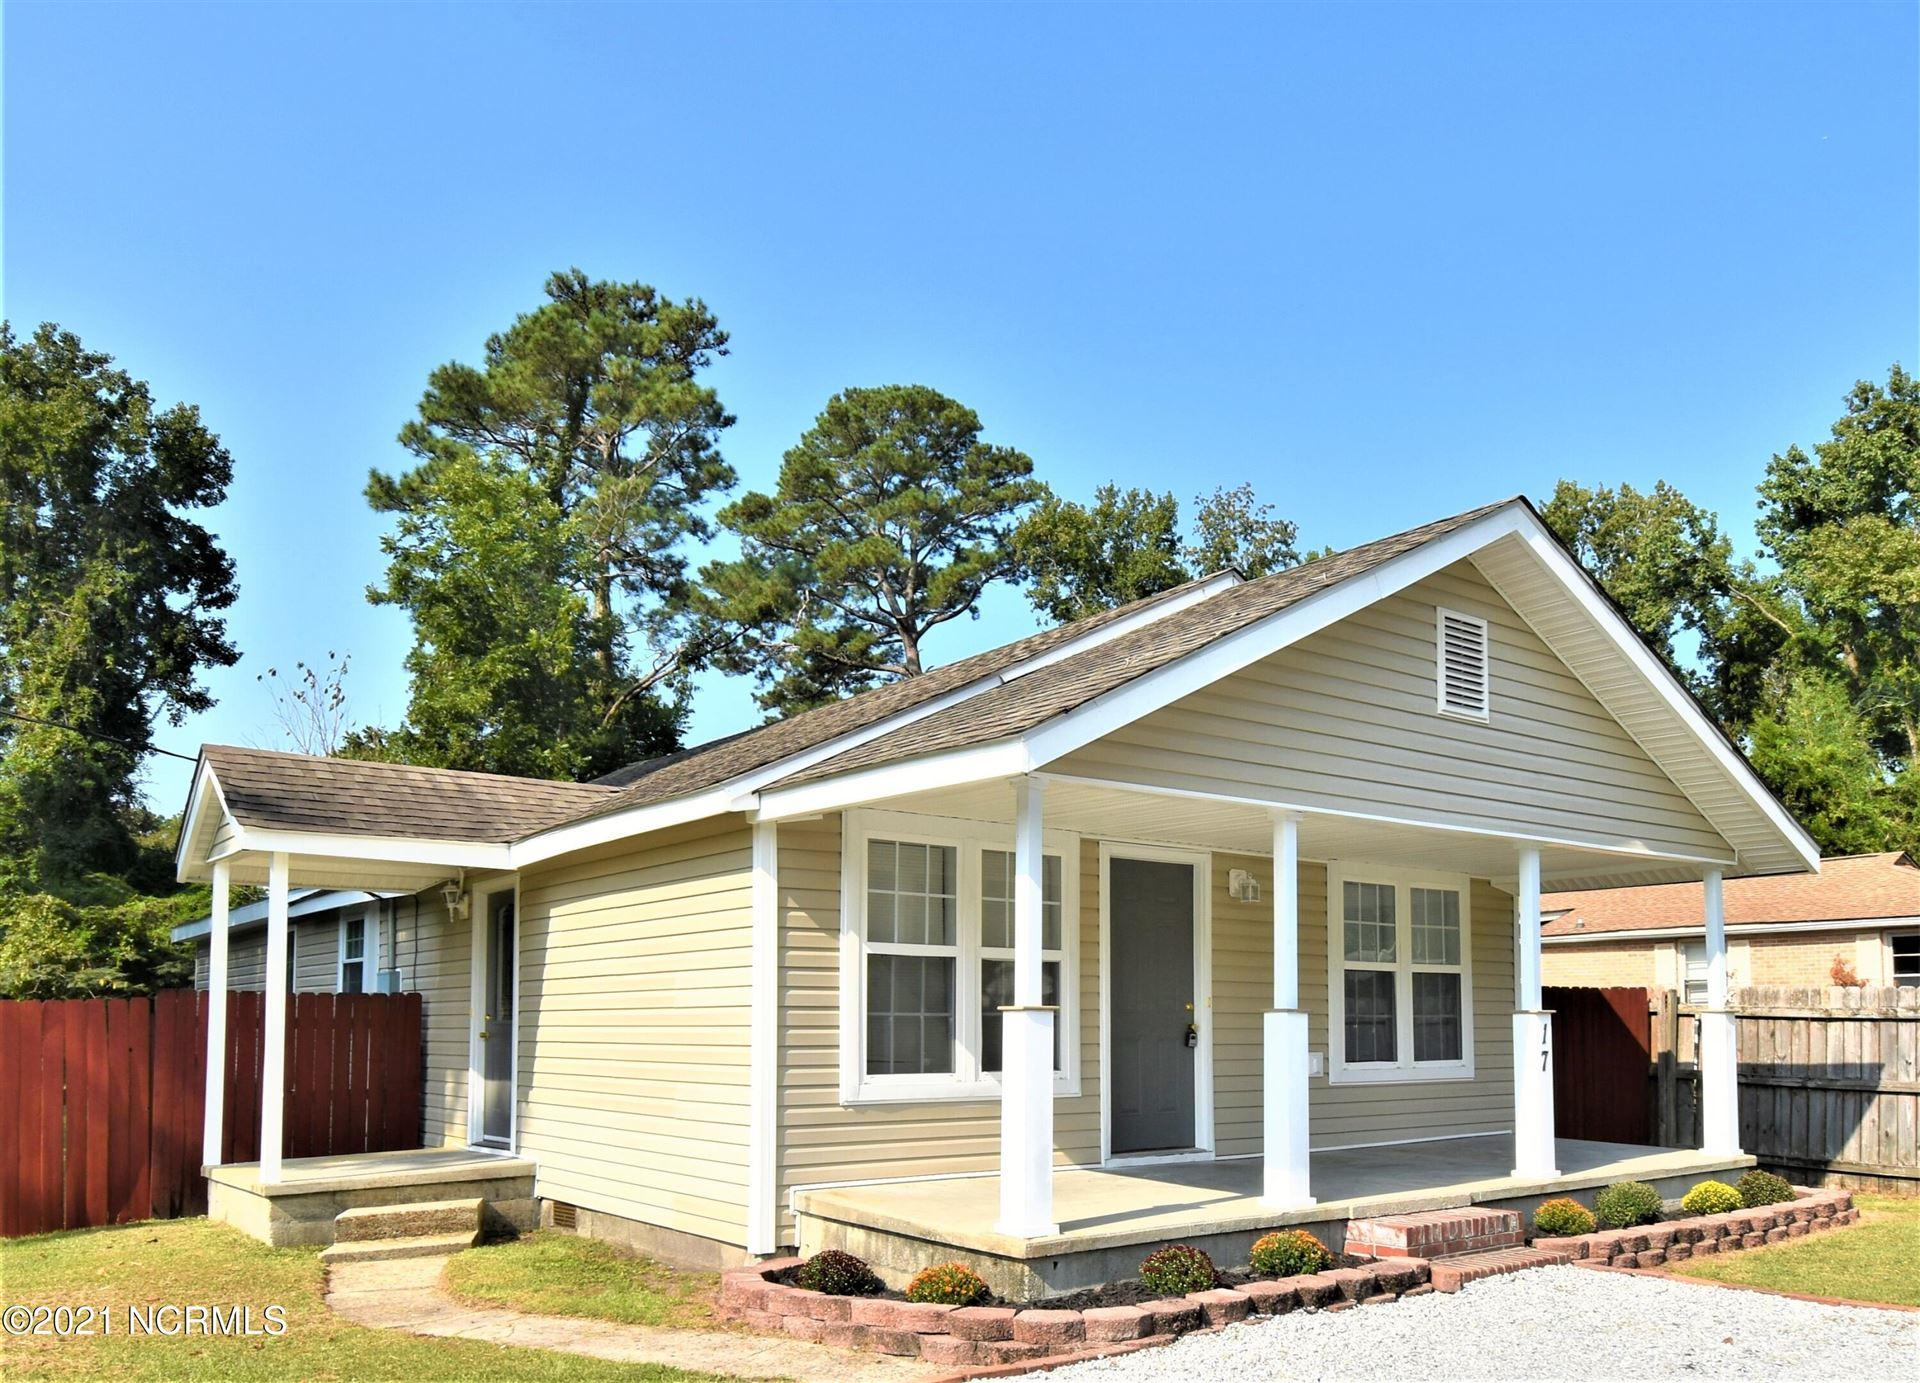 Photo of 17 Enouch Lane, Jacksonville, NC 28540 (MLS # 100293514)